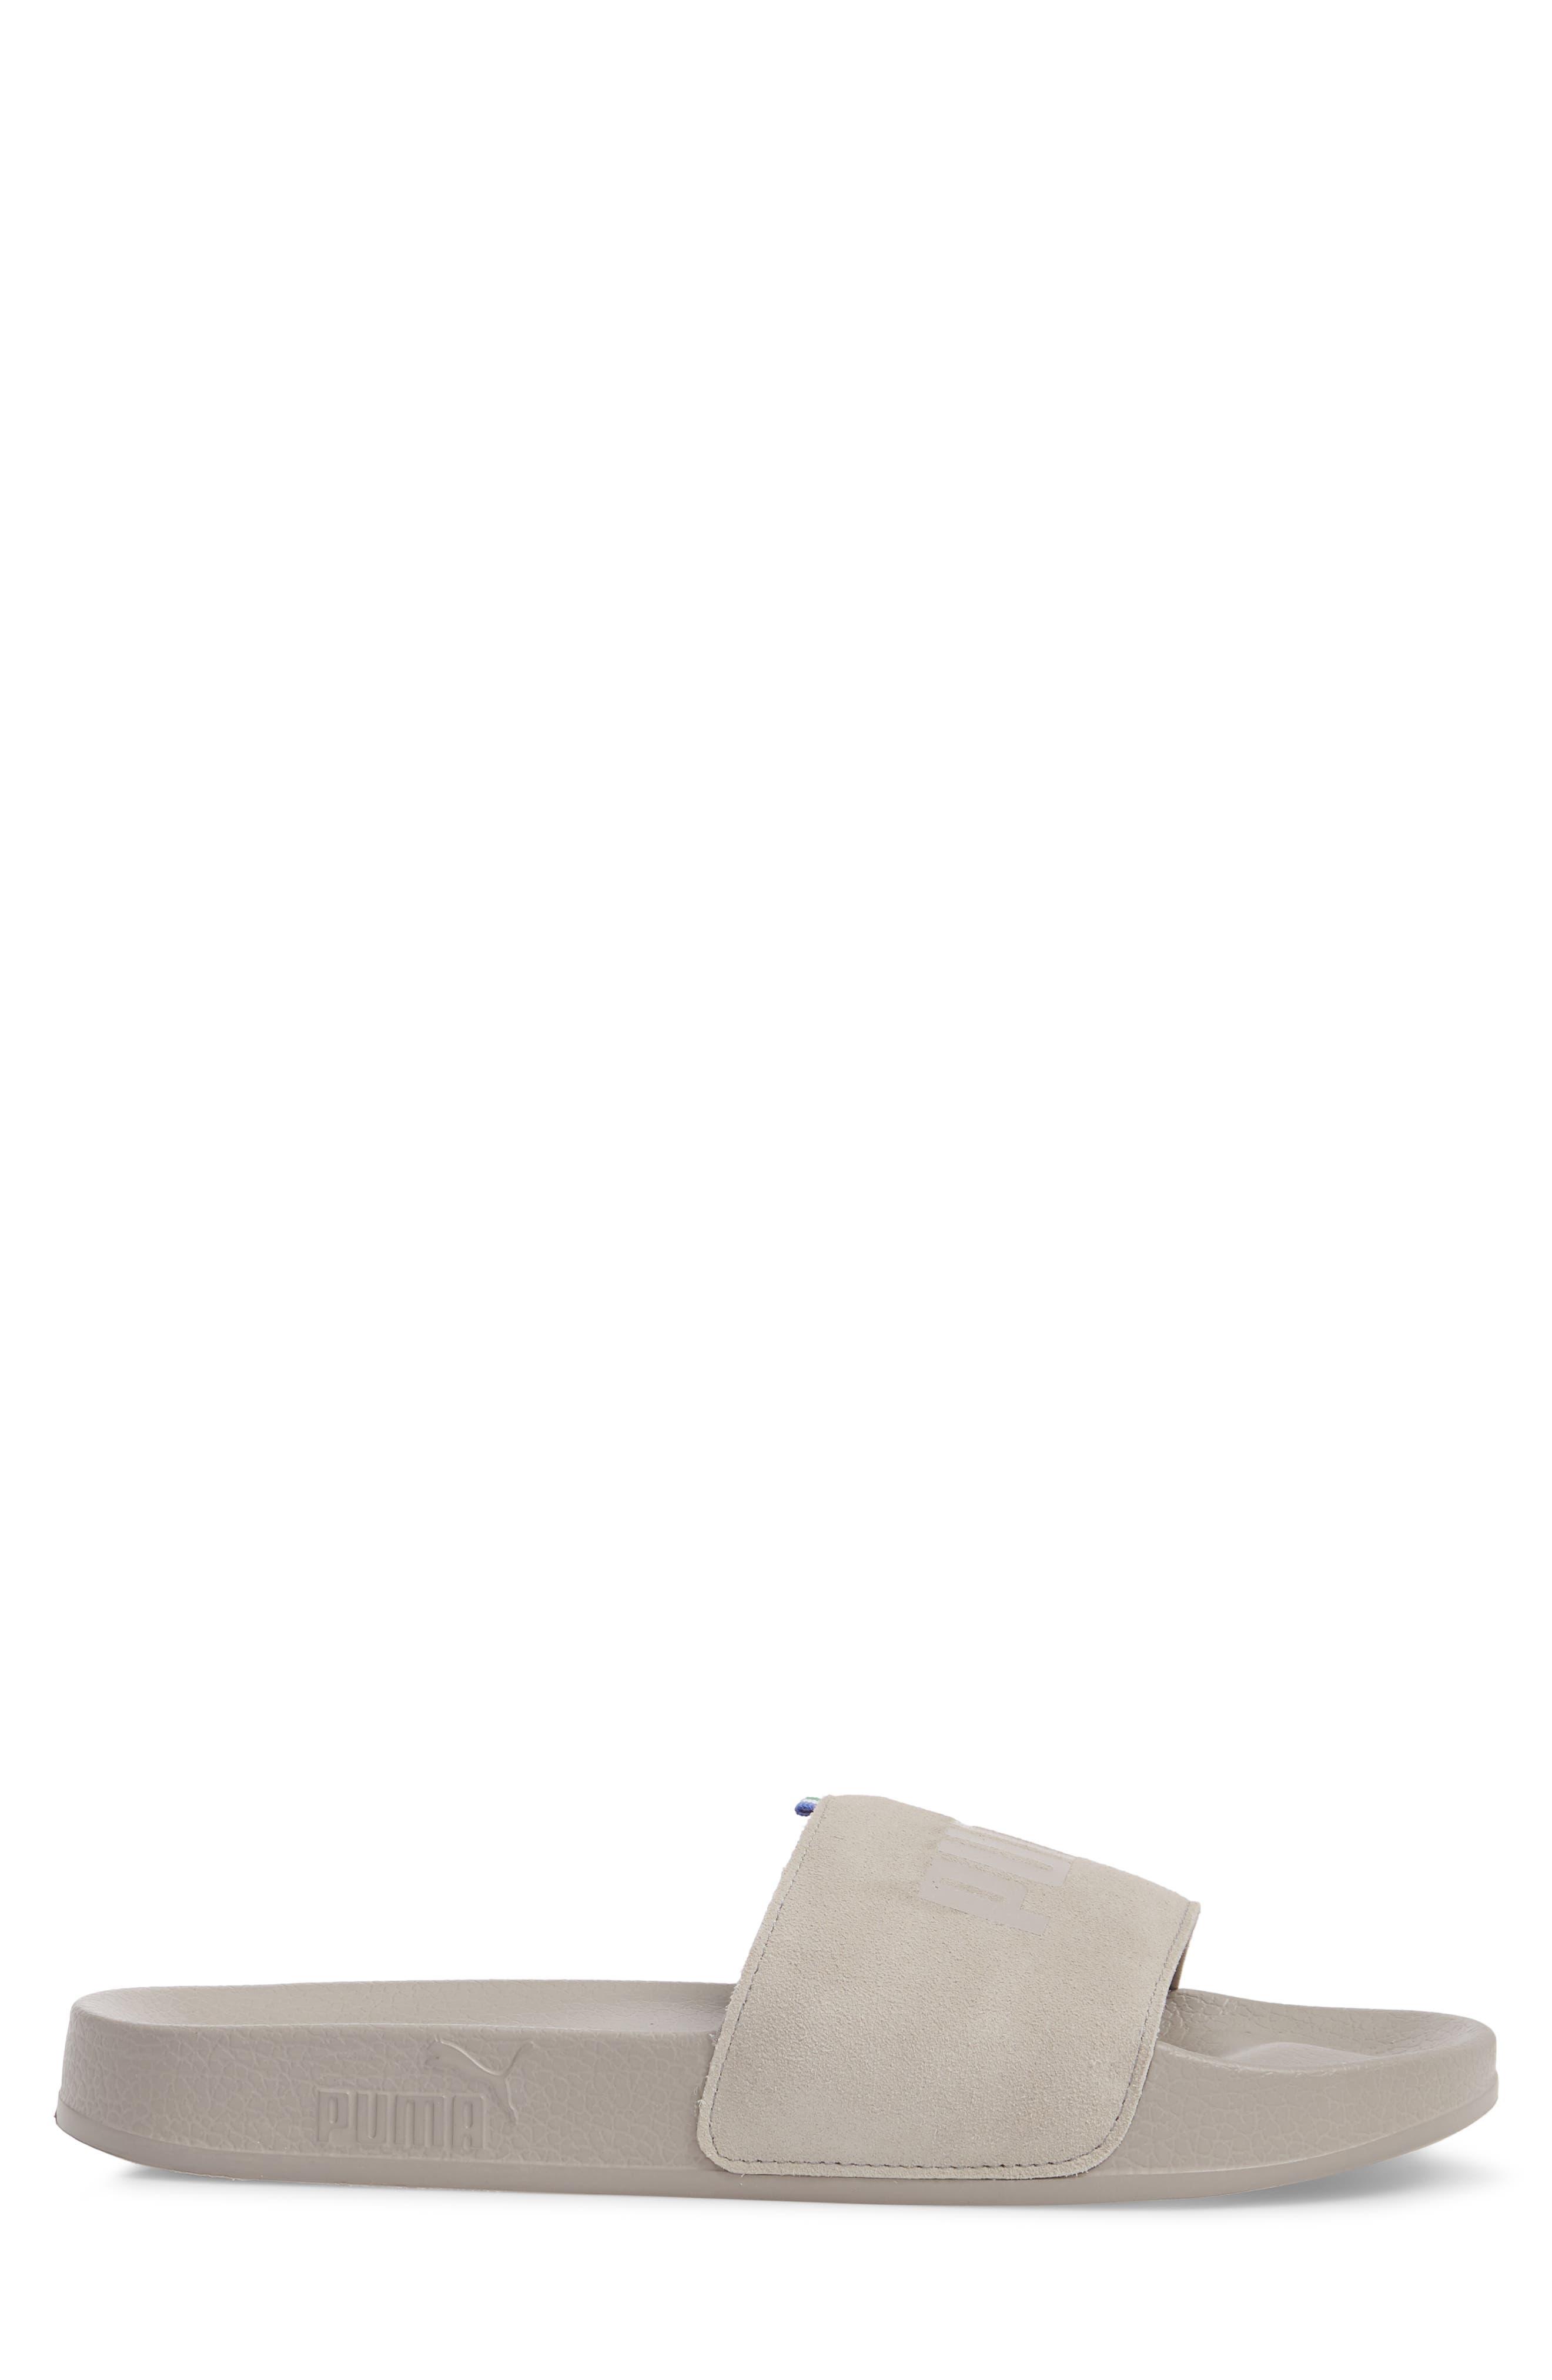 x Big Sean Leadcat Slide Sandal,                             Alternate thumbnail 3, color,                             060